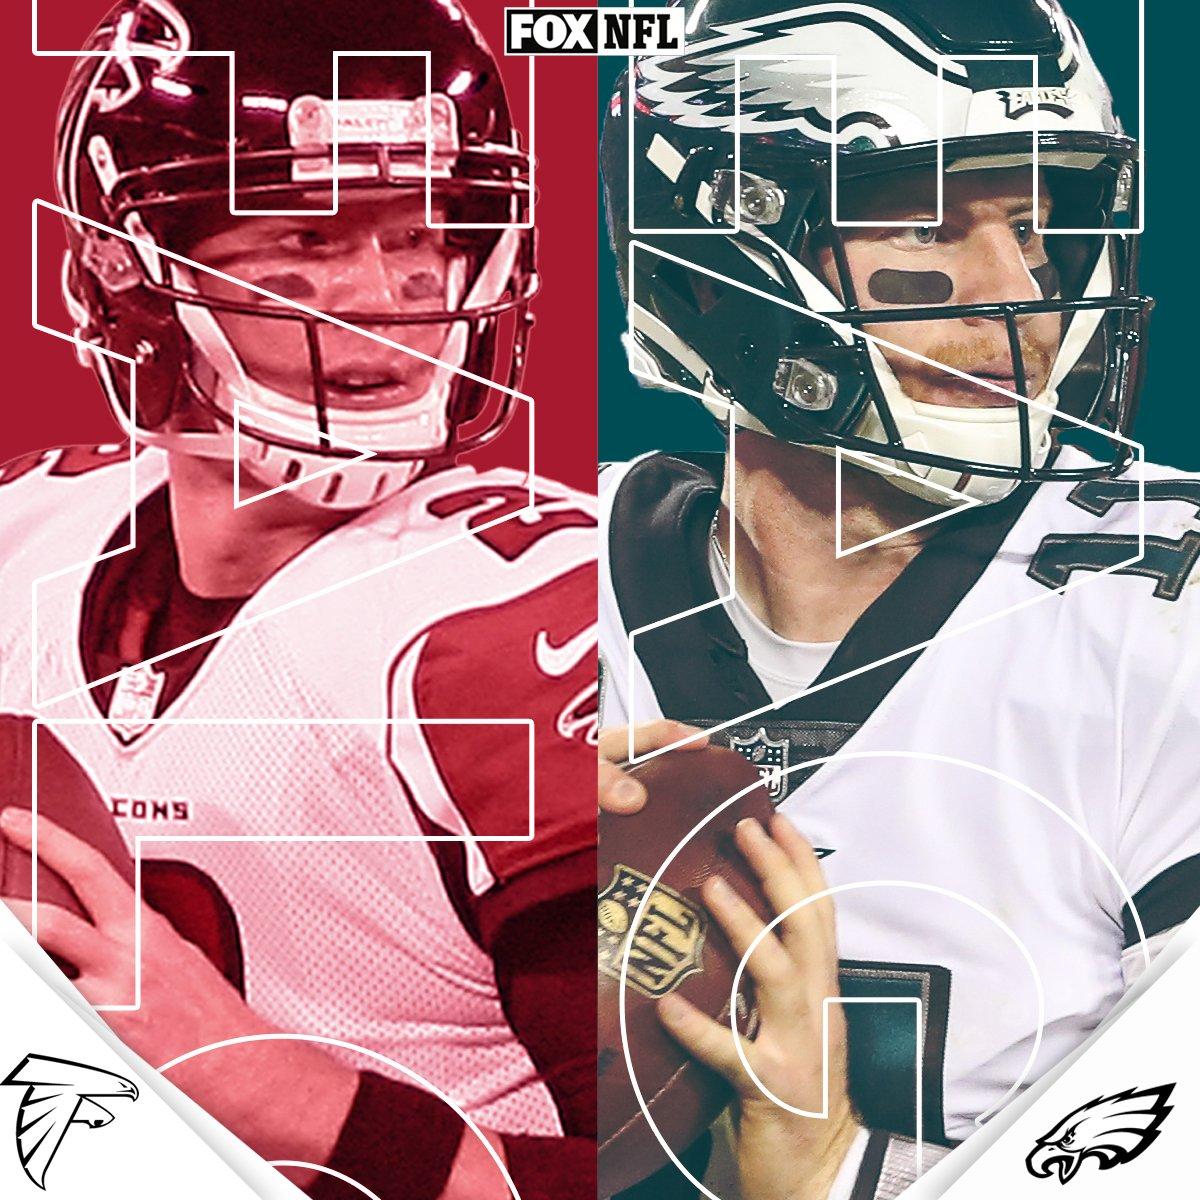 NFLonFOX falcons